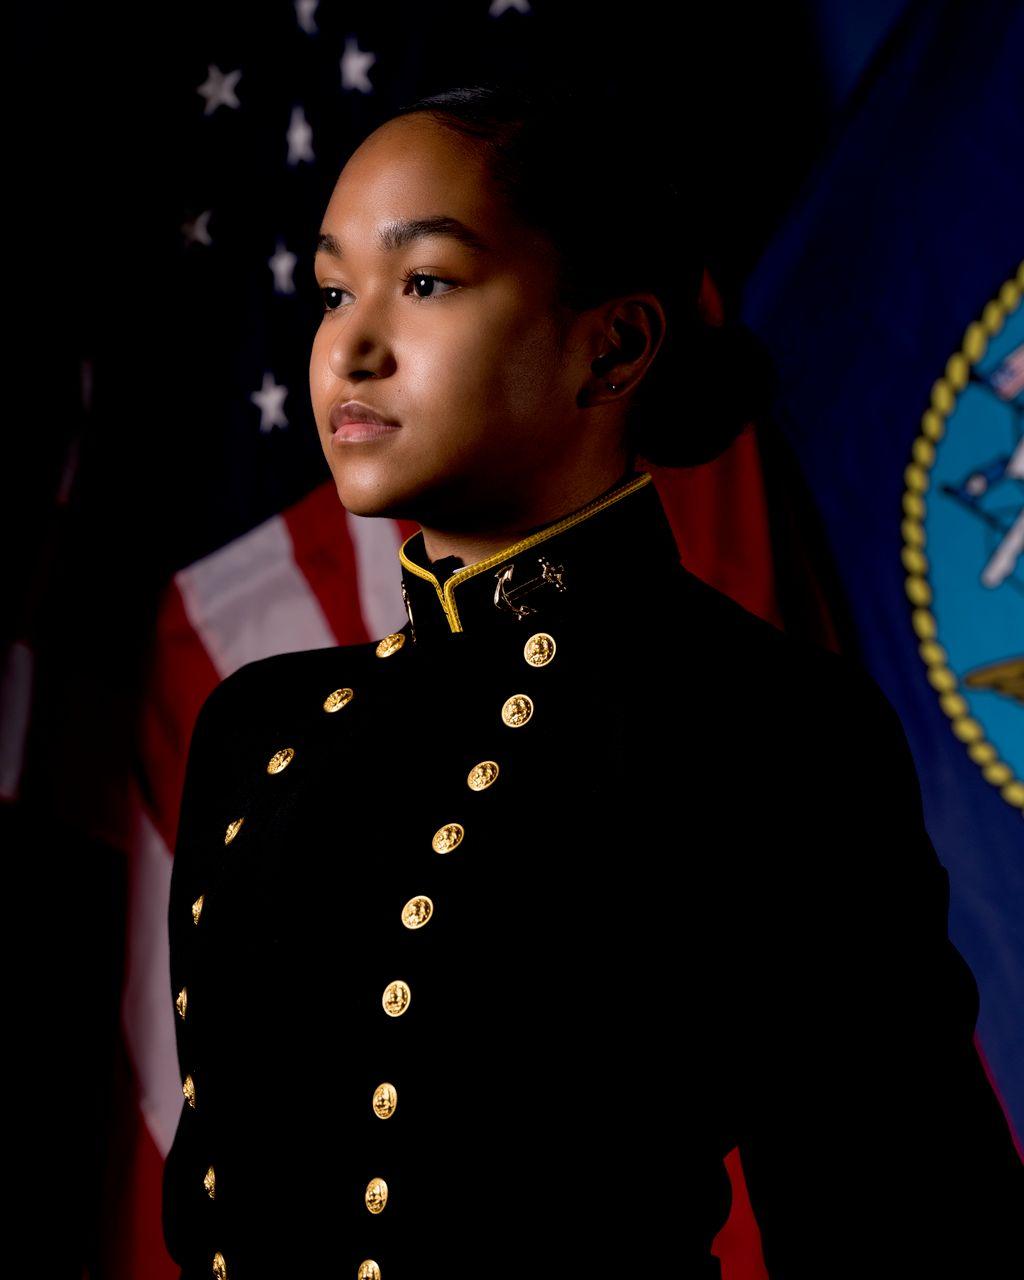 Naval Academy Portraits